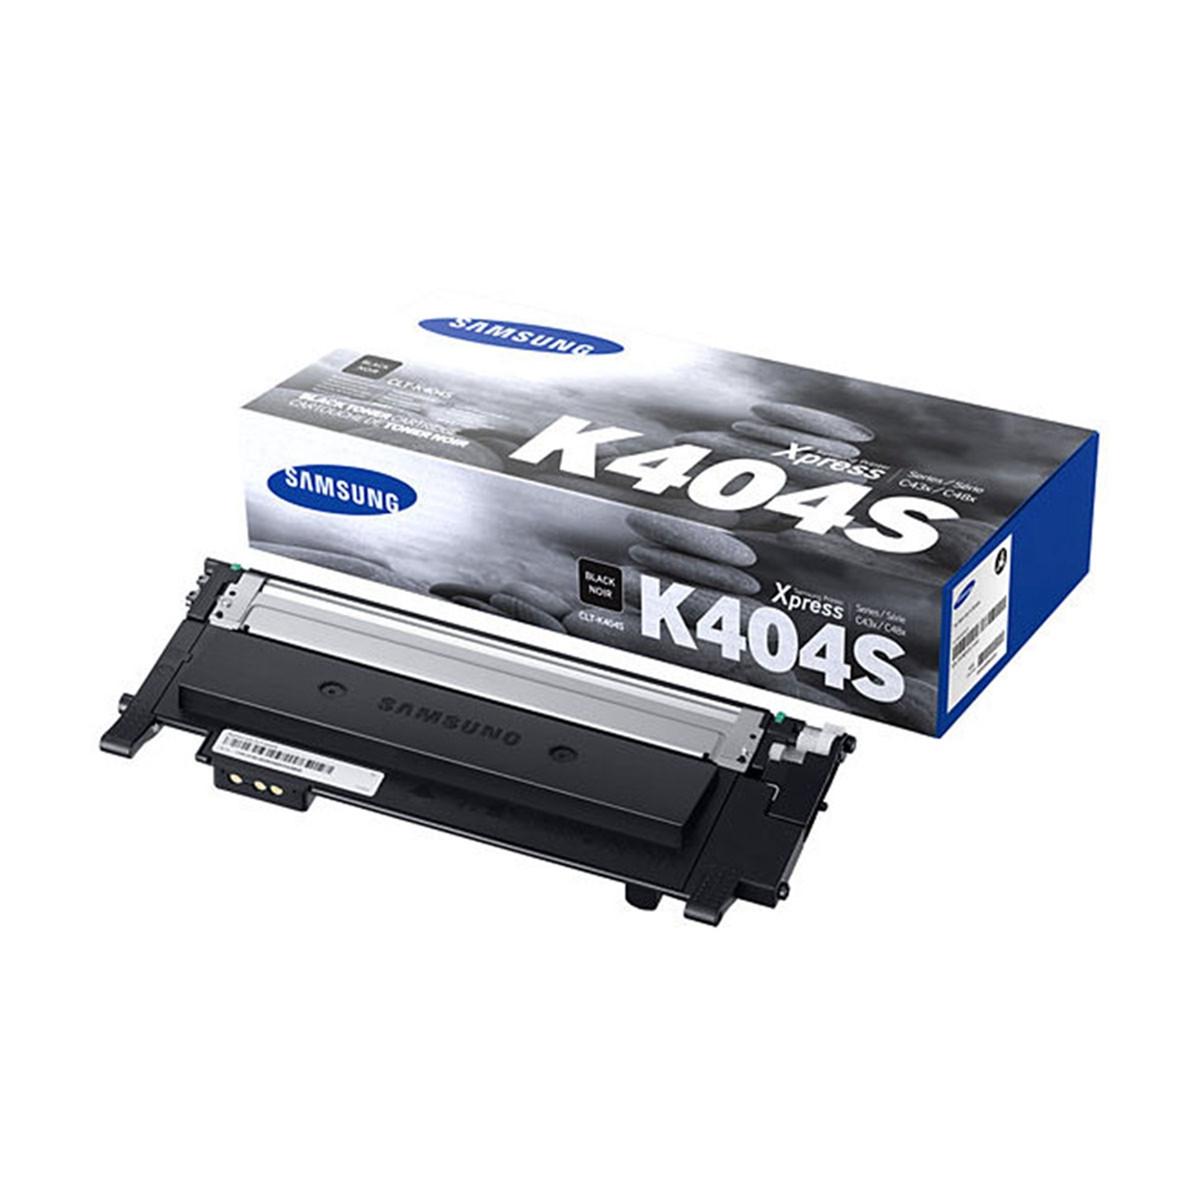 Toner Samsung CLT-K404S Preto | C430 C480 C430W C480W C480FW 430W 480W 480FW | Original 1.5k